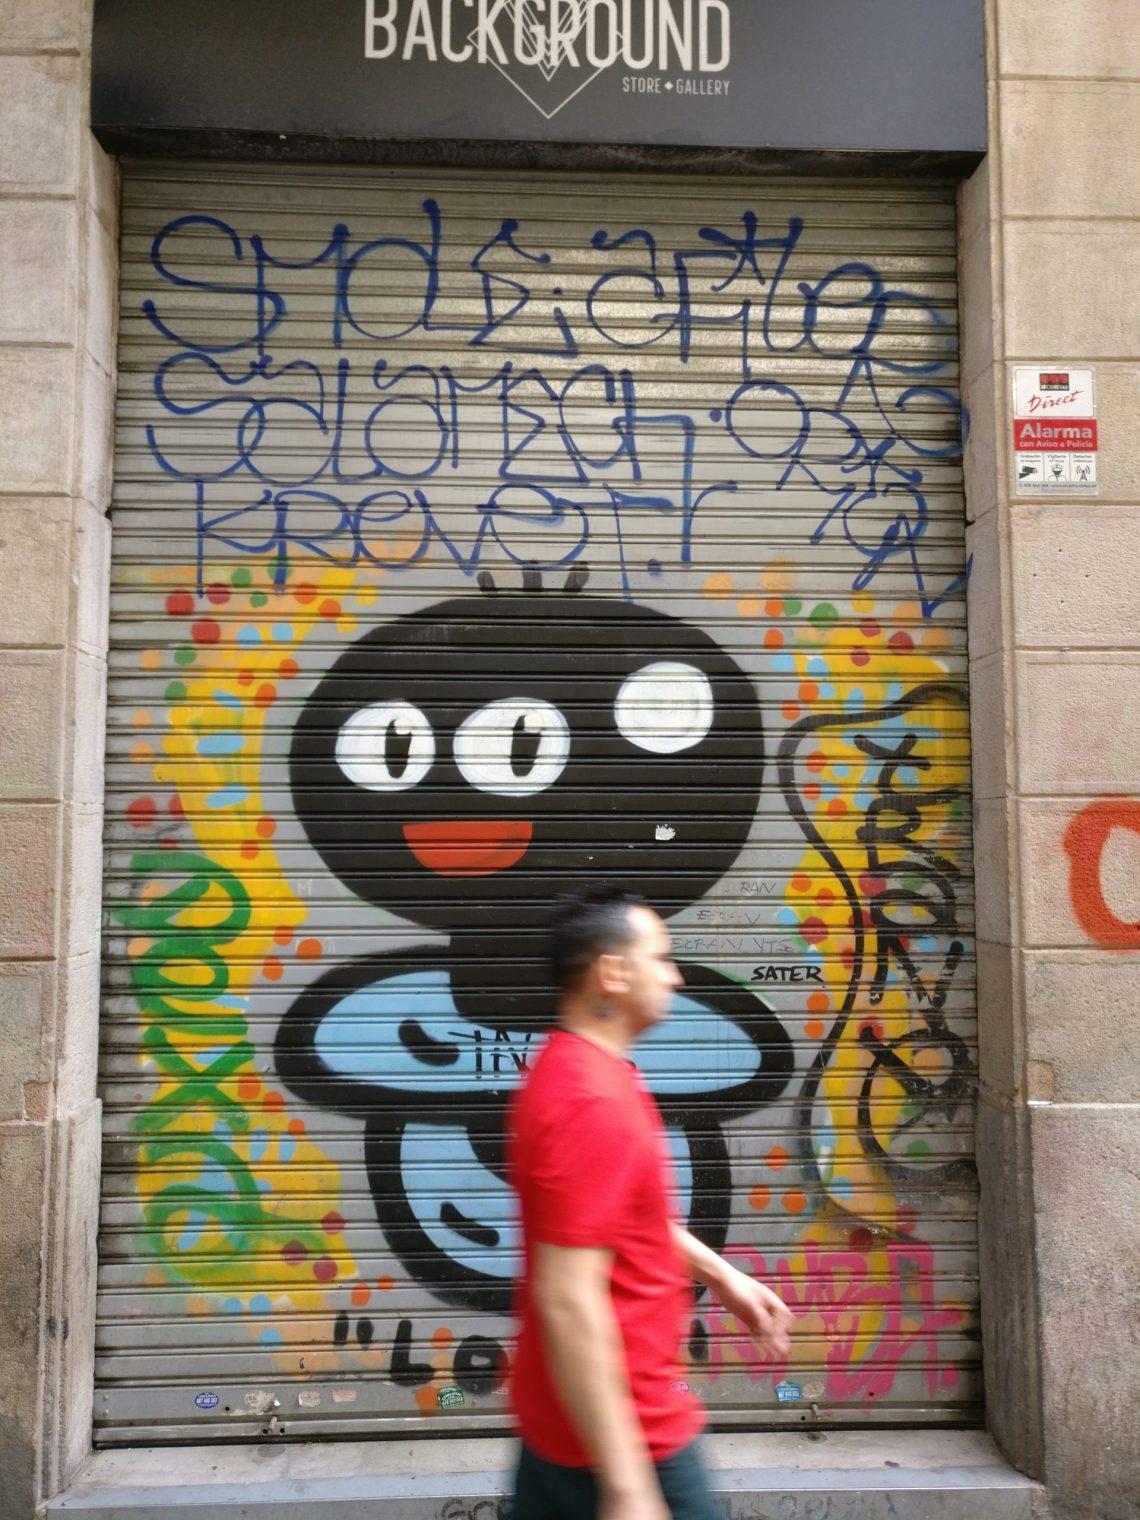 Barcelona street art by El Xupet Negre